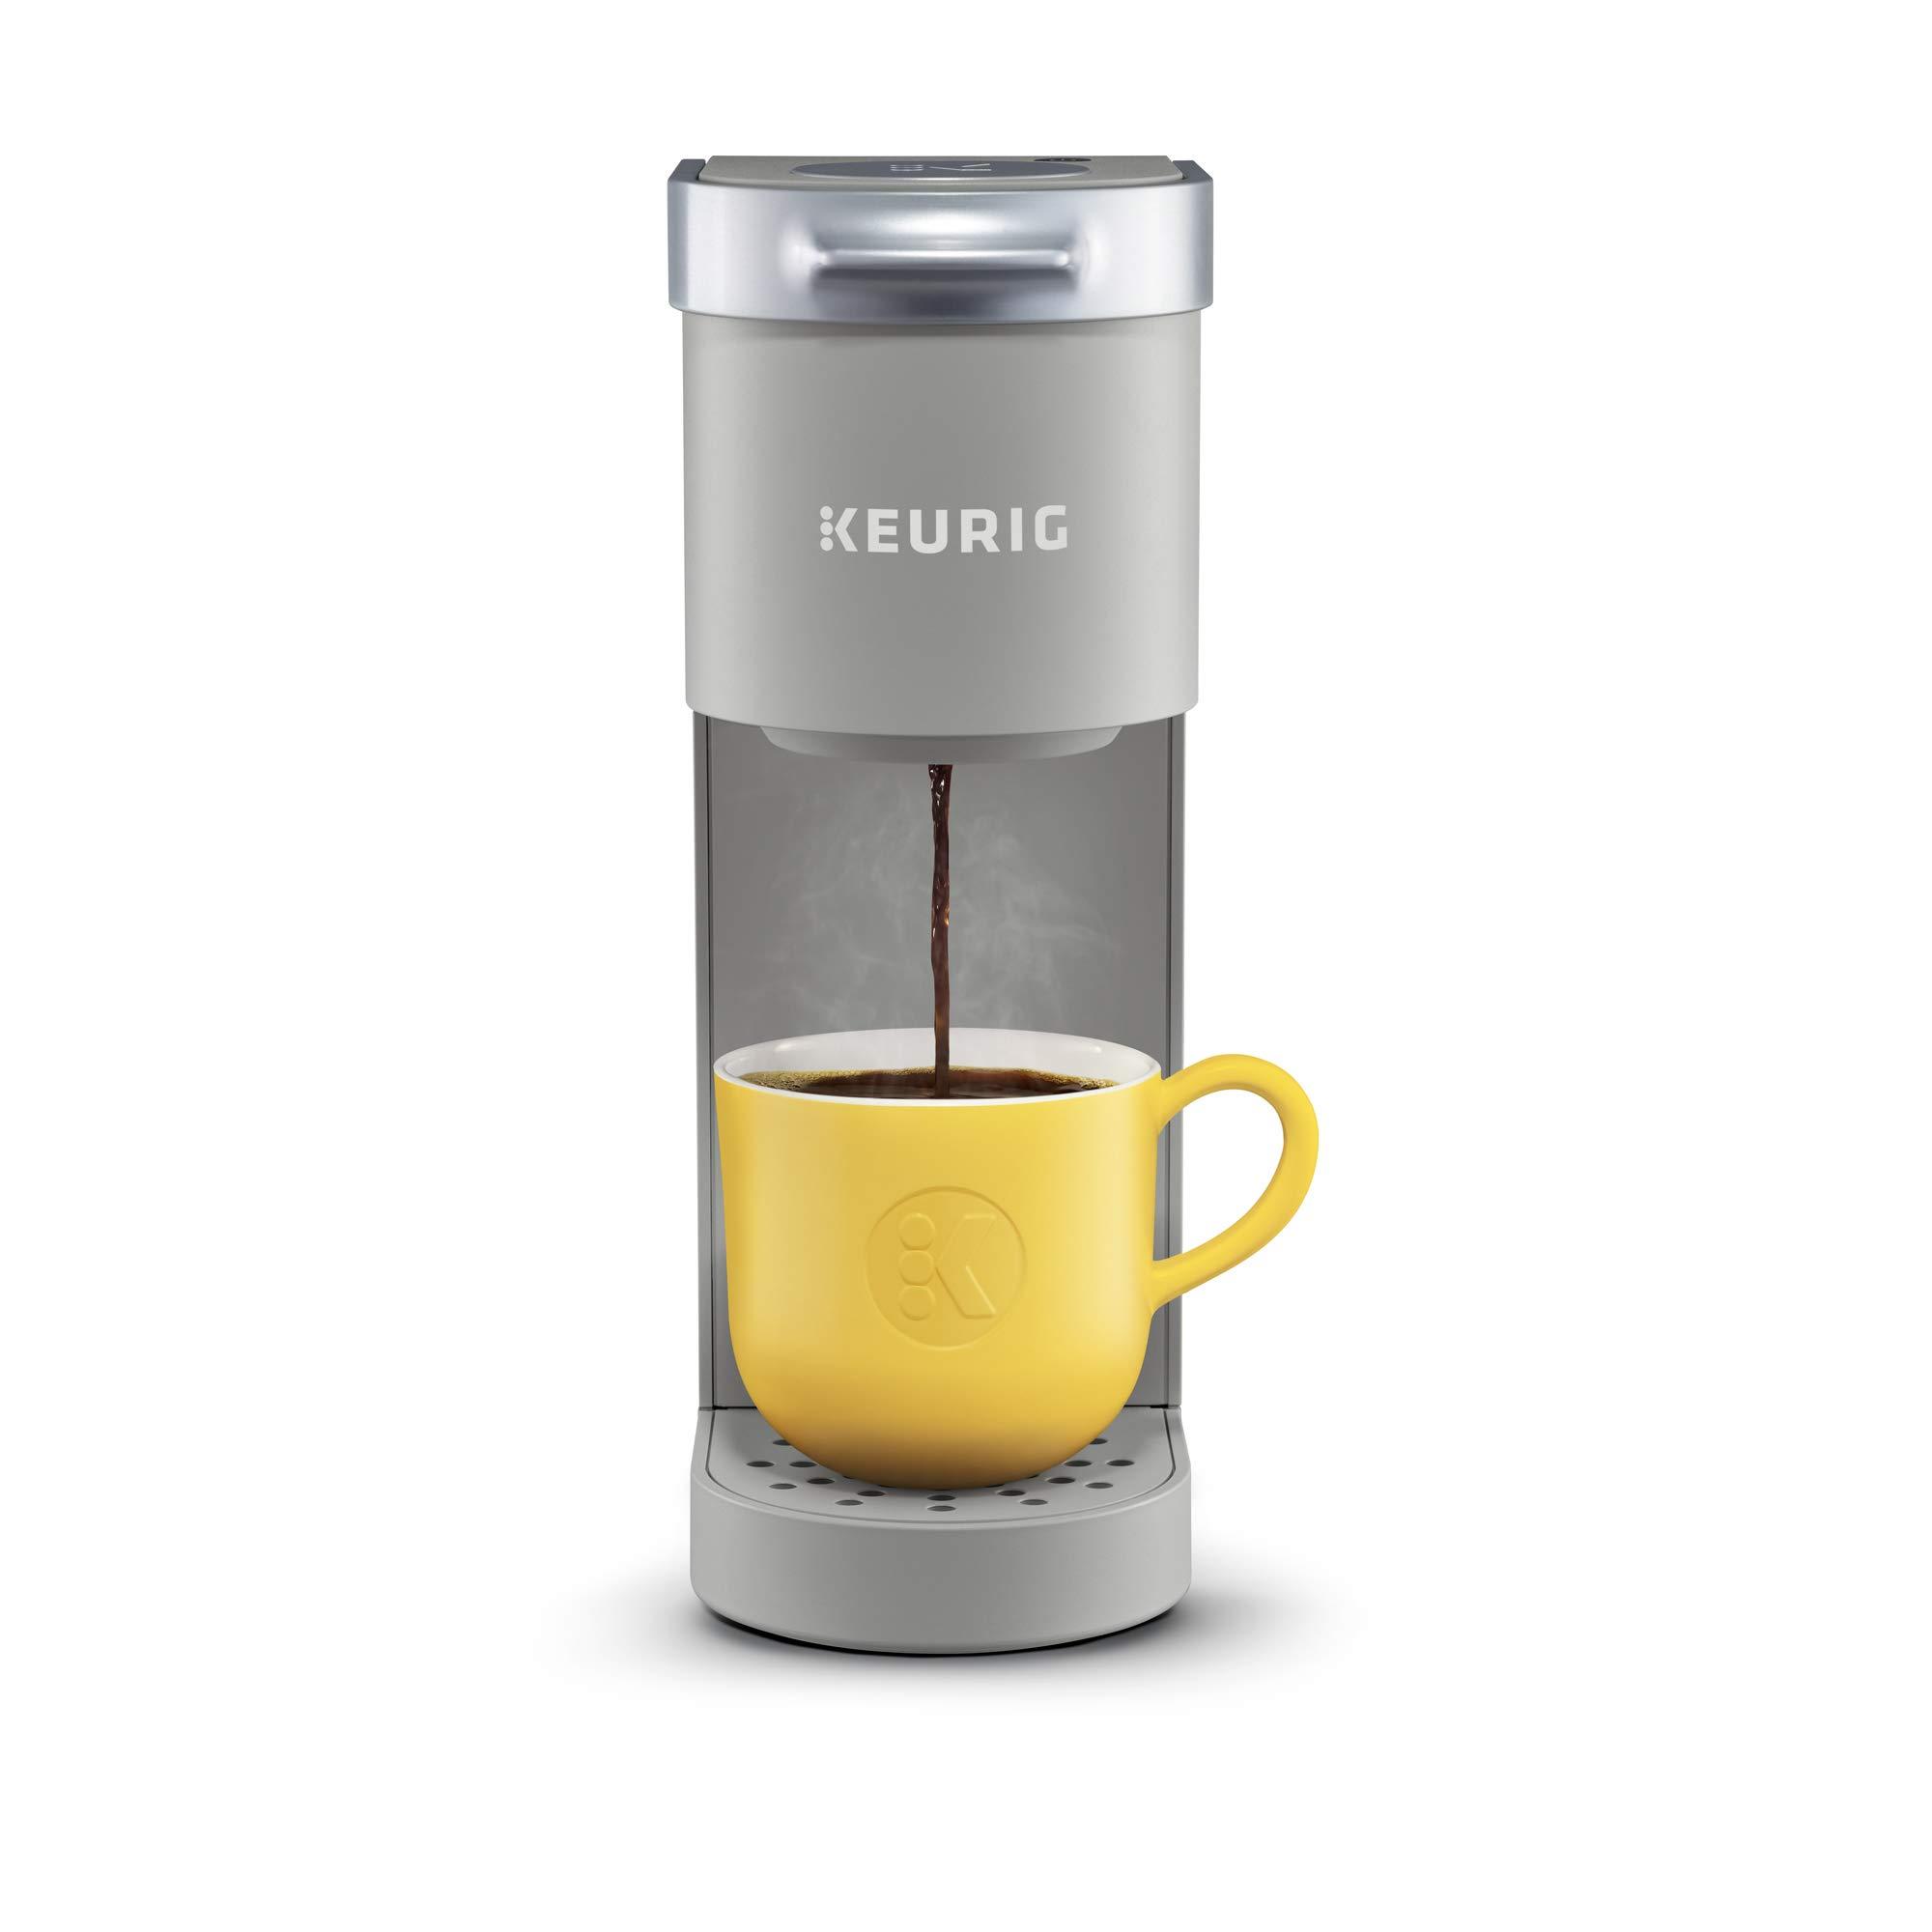 Keurig K-Mini Single Serve Coffee Maker, Studio Gray